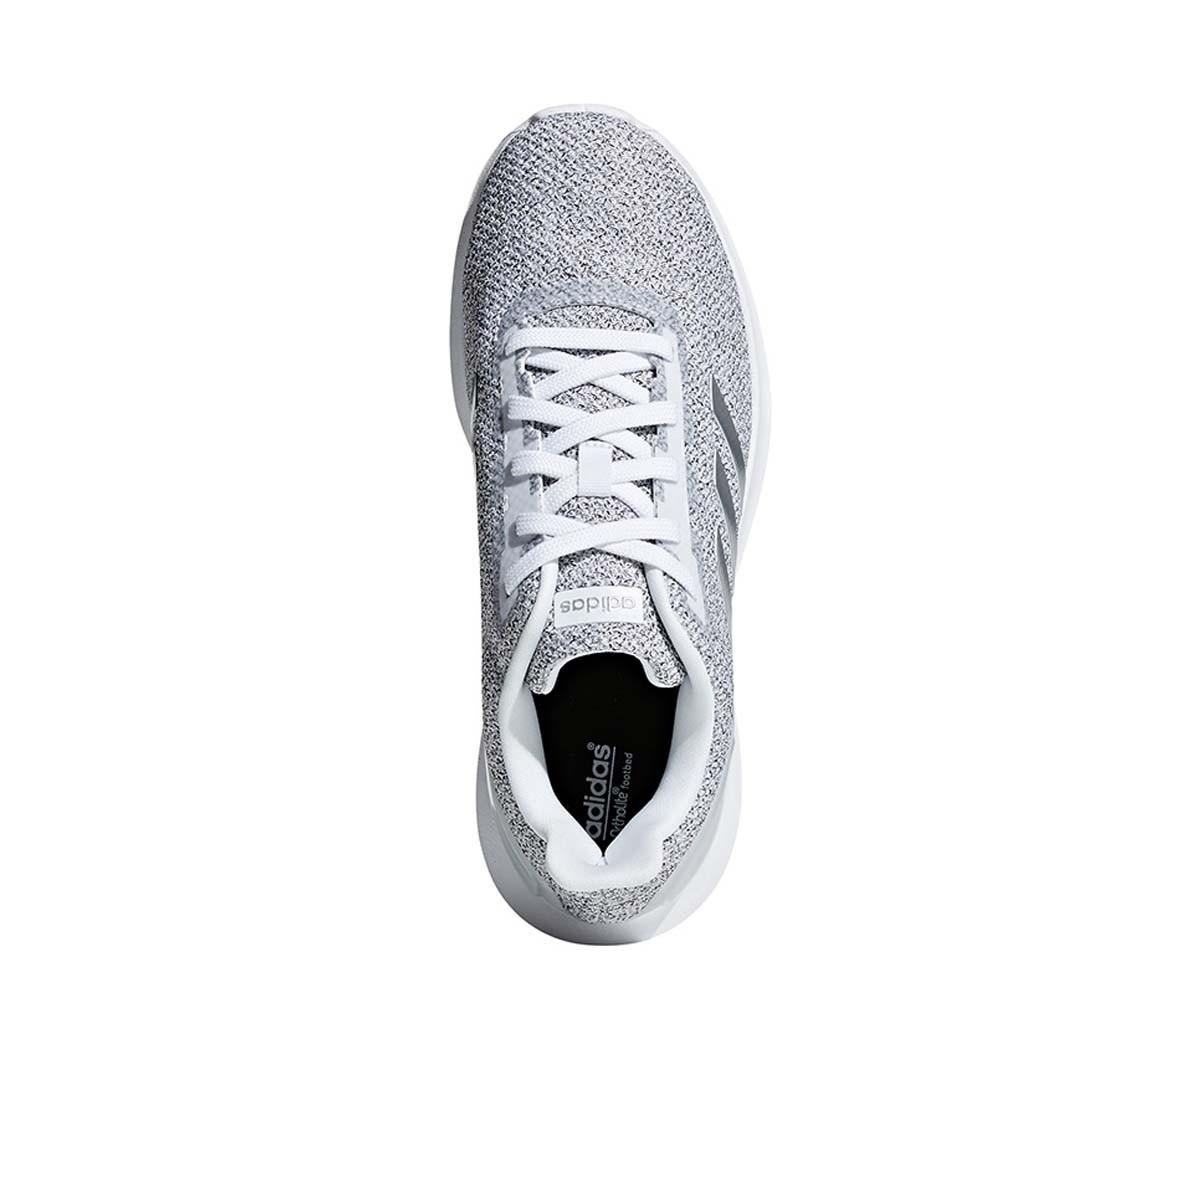 83b0adf06e0 Adidas COSMIC 2 RUNNING ΓΥΝΑΙΚΑ - DB1760 | Sportifs.gr Οnline αγορές ...